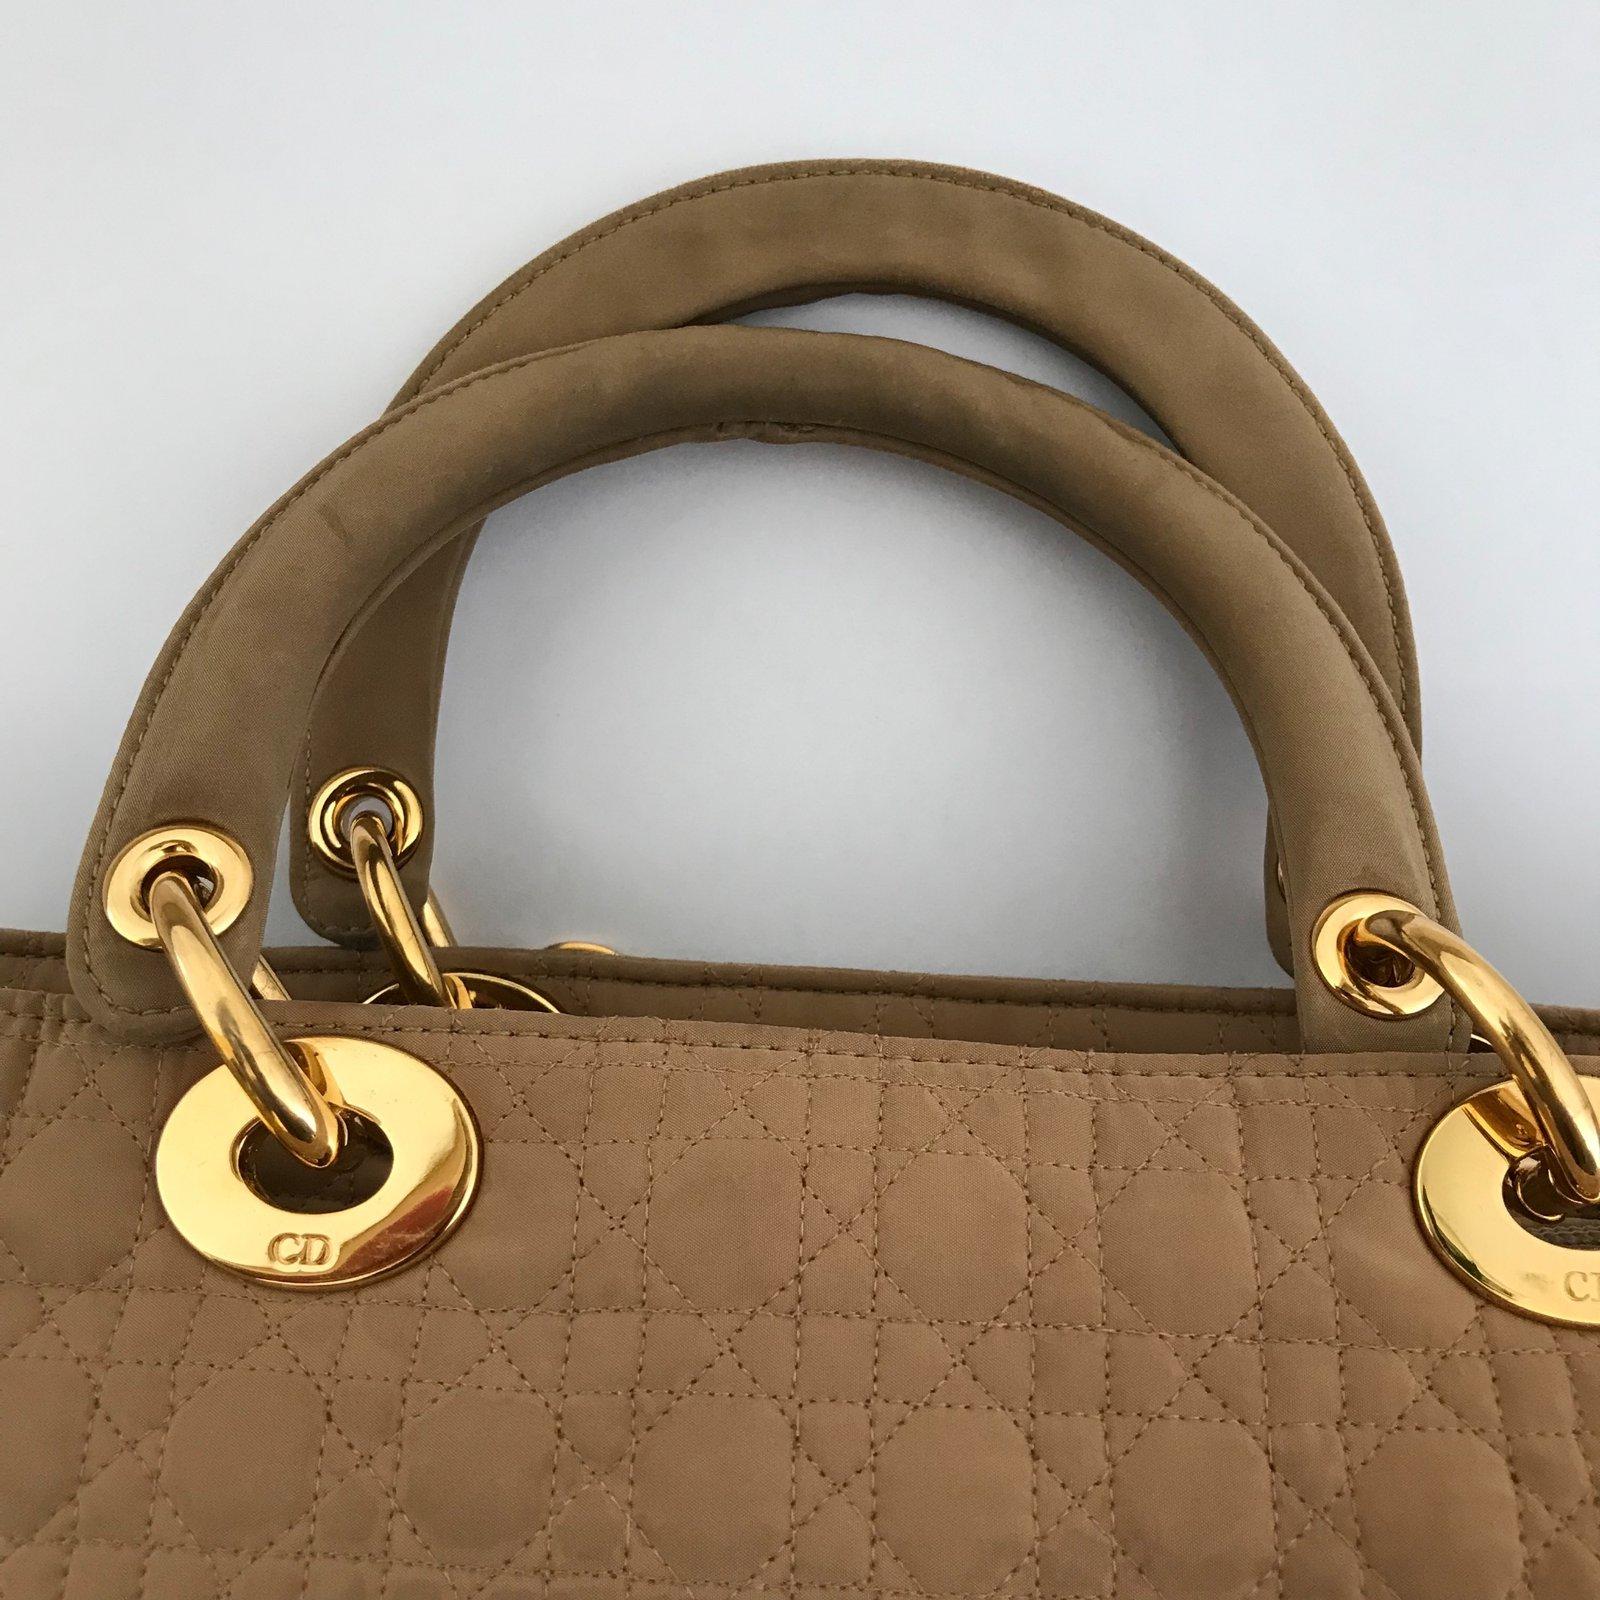 429f6d7885e Christian Dior Lady Dior bag Handbags Nylon Beige ref.72931 - Joli Closet